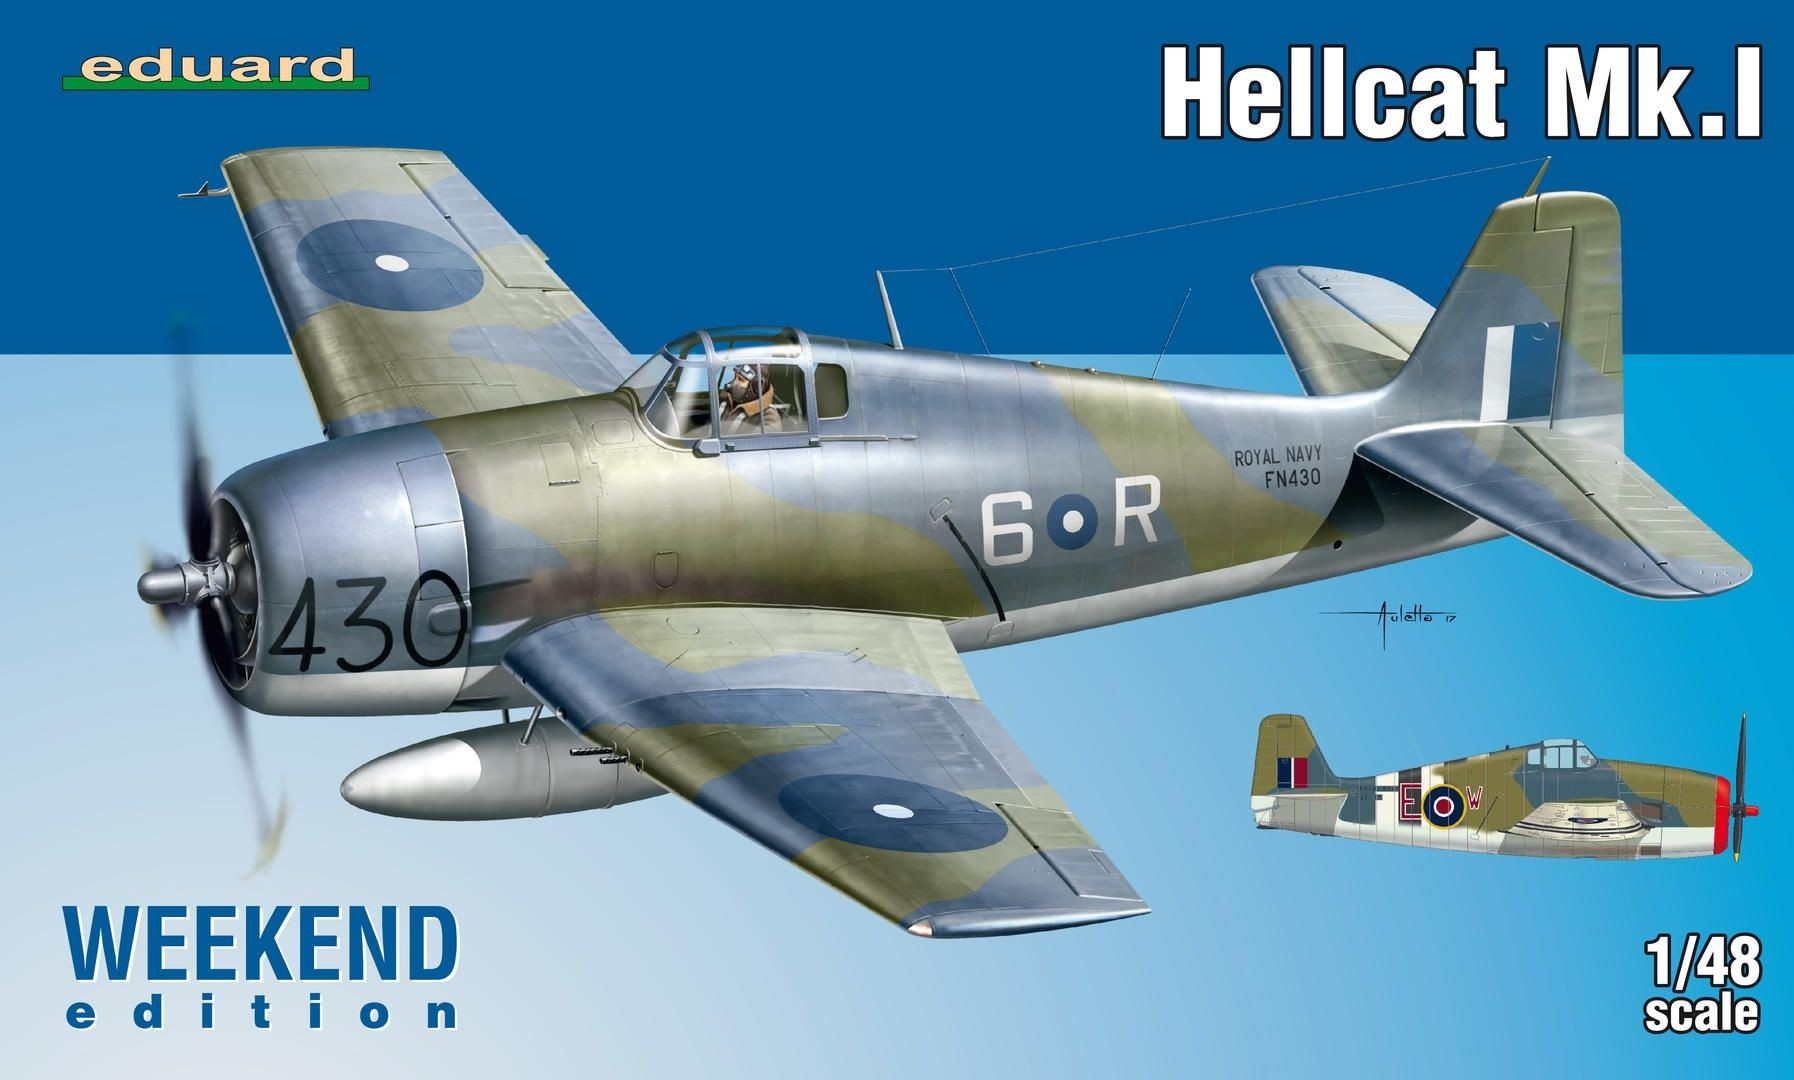 Hellcat Mk.1 (Weekend Edition)